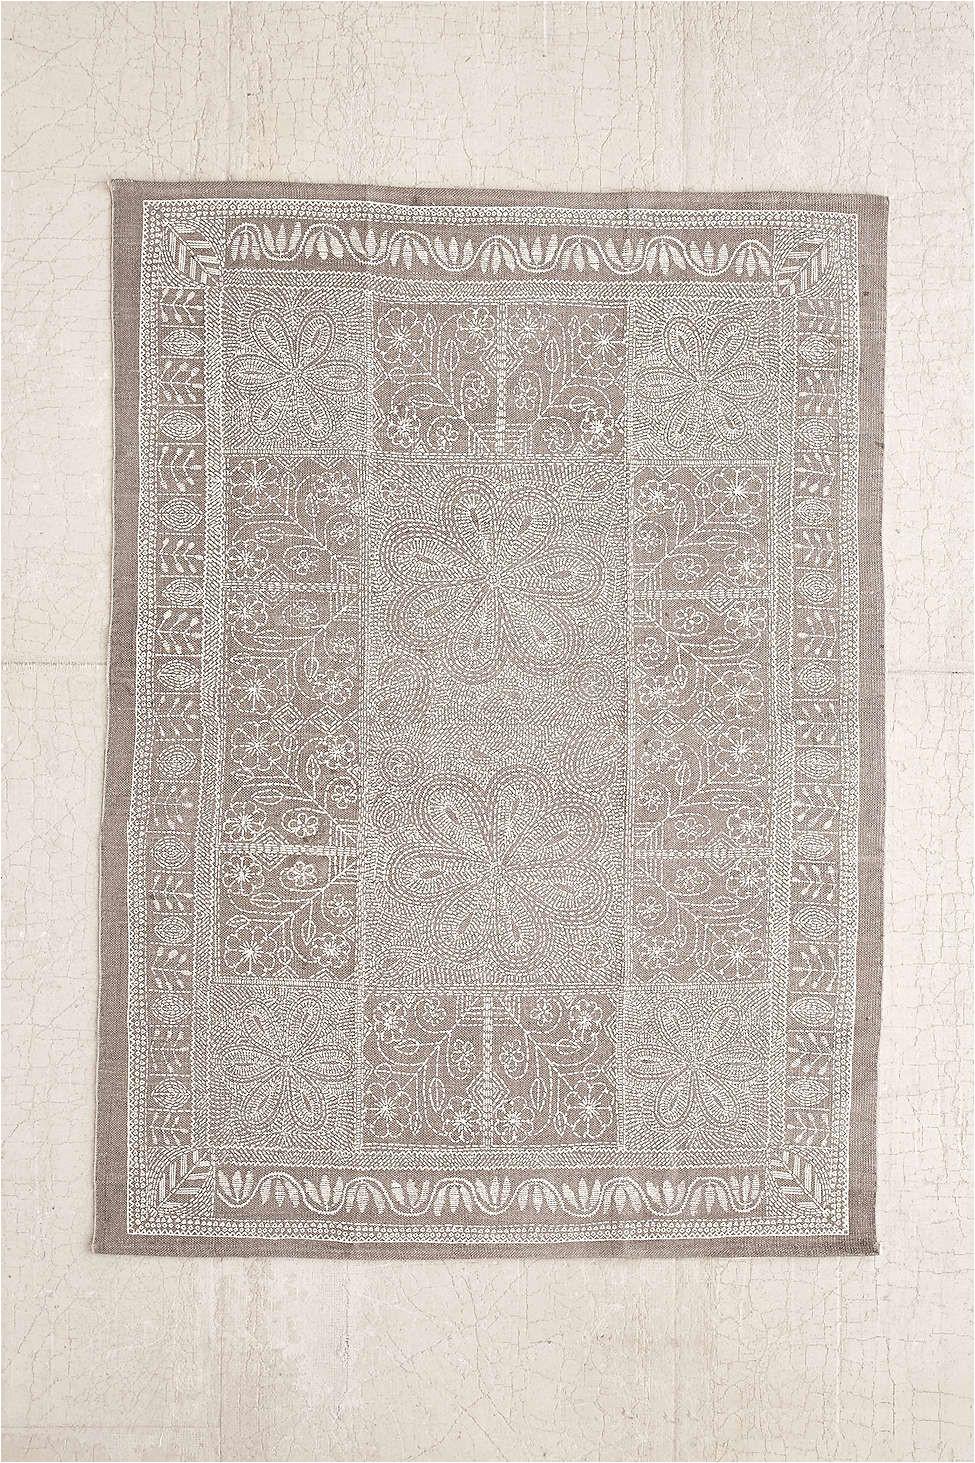 plum bow margarita stitch mark printed rug 5x7 99